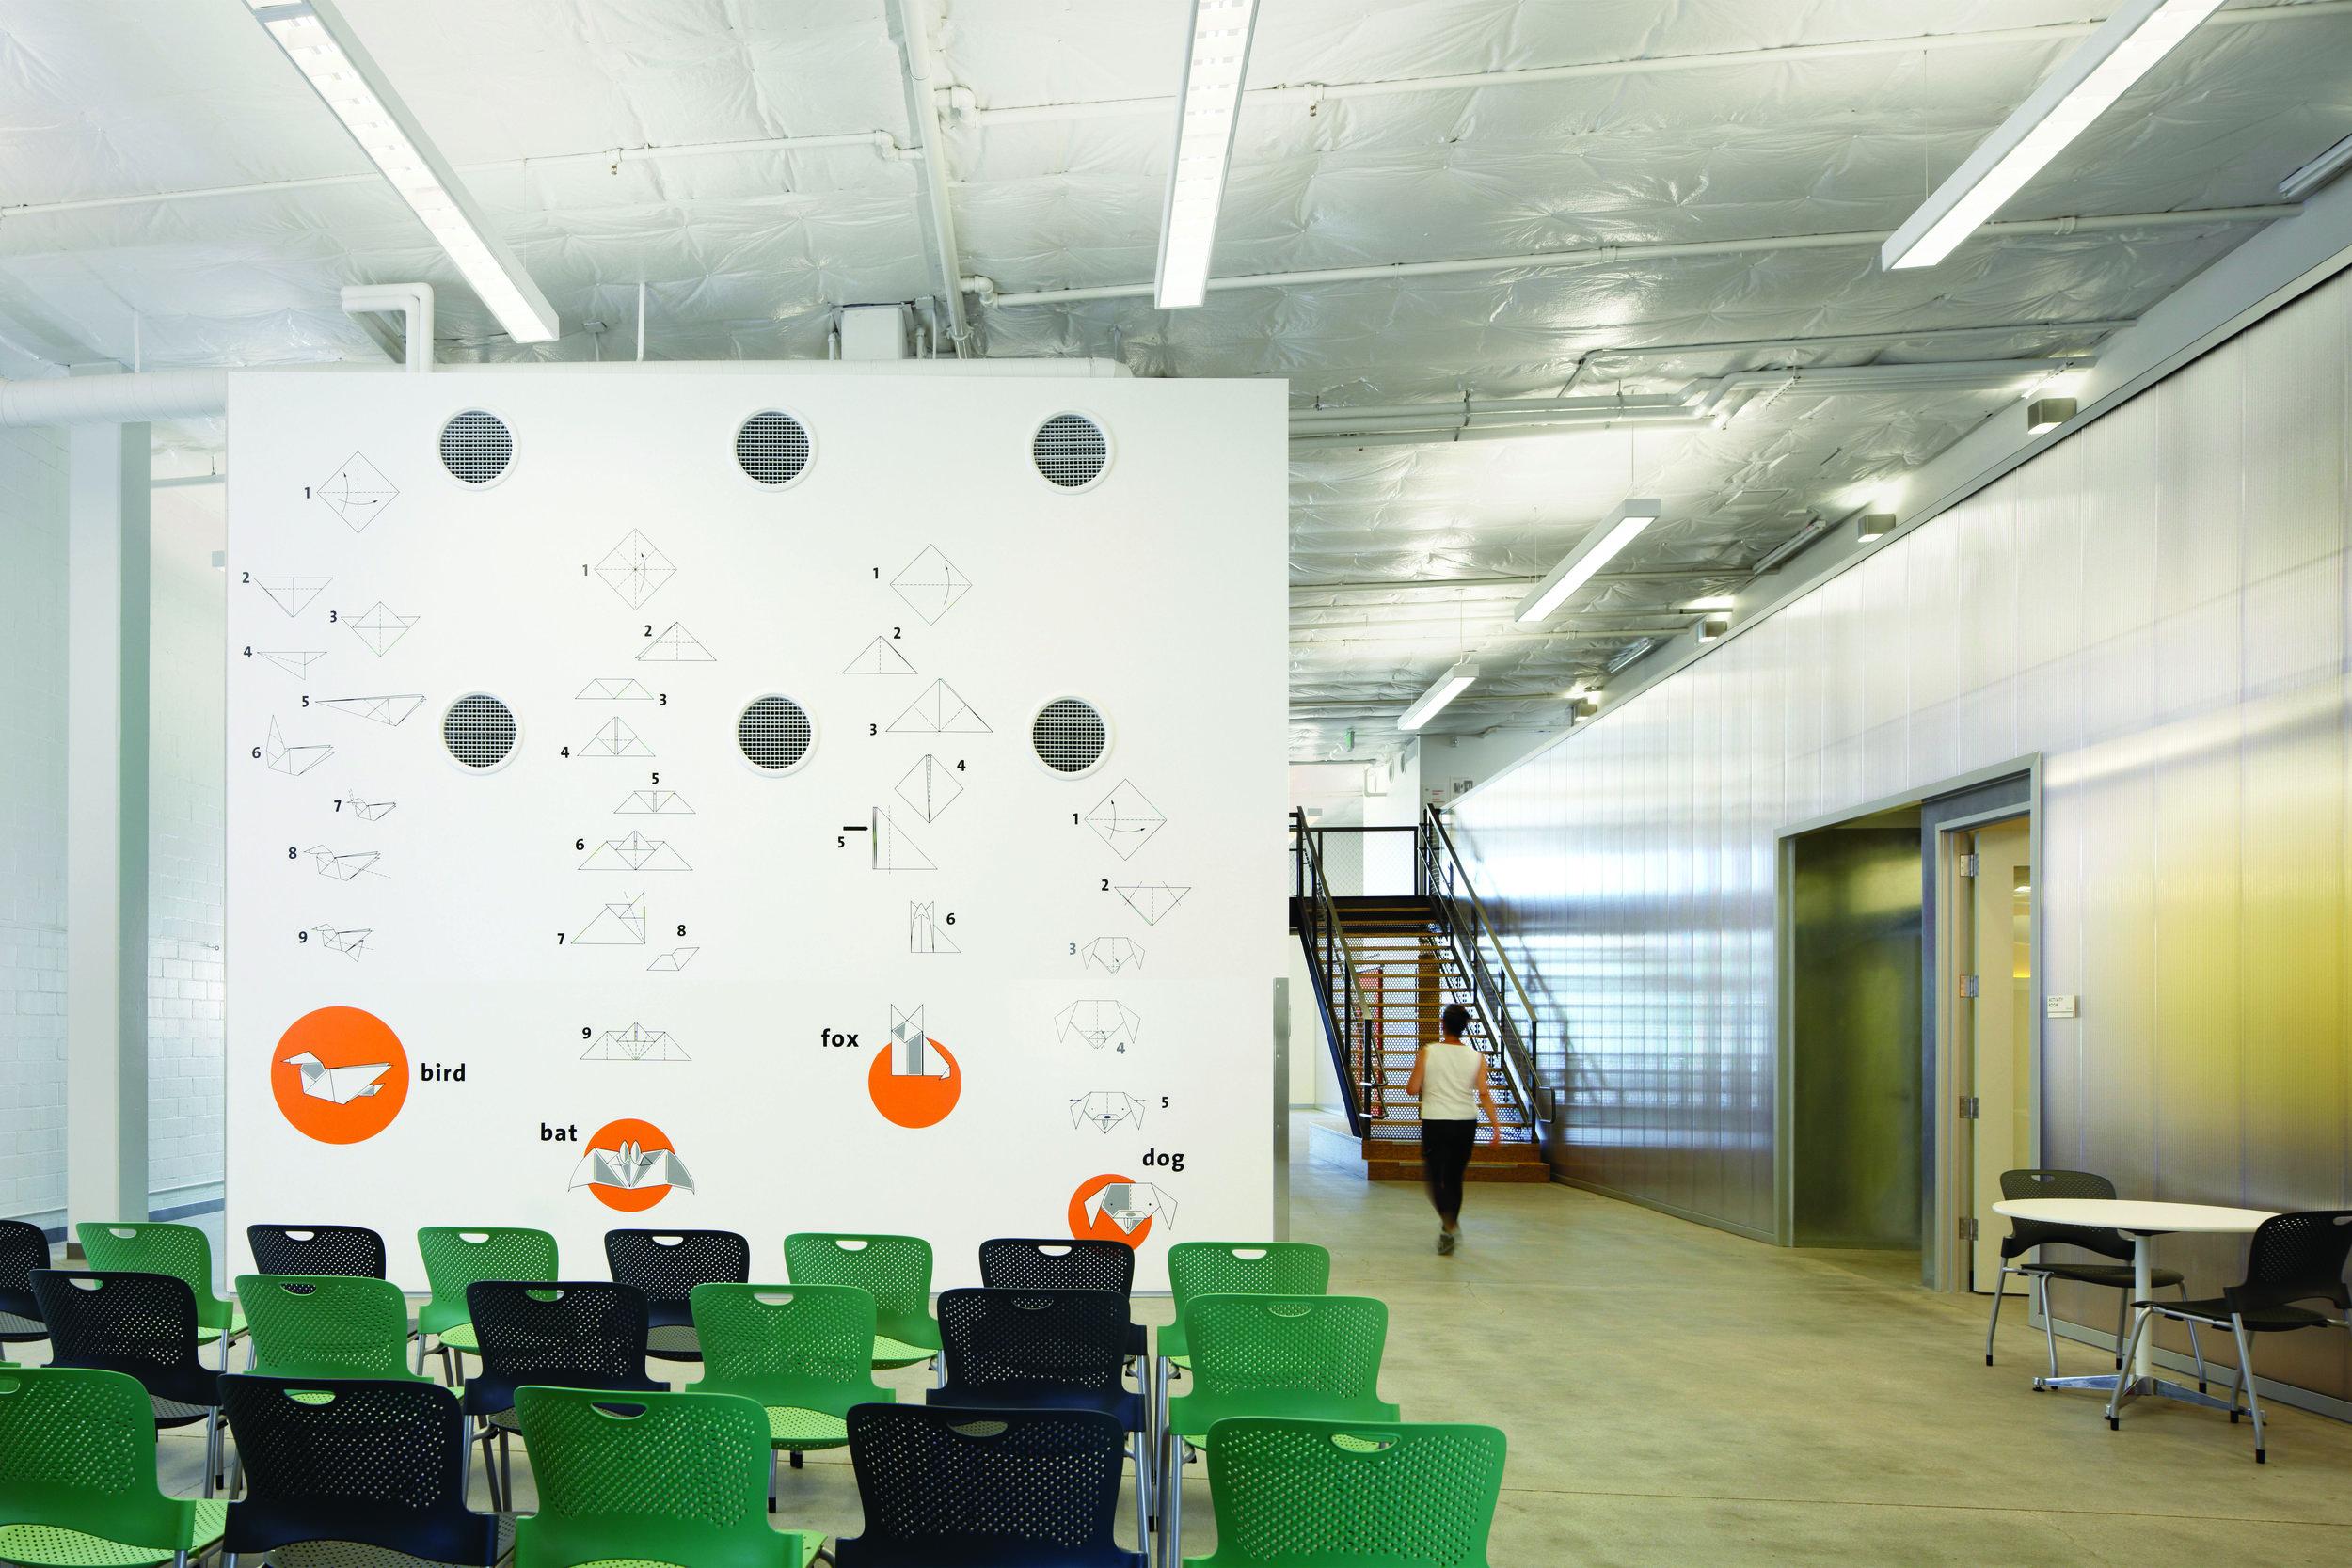 Otis Booth Campus - Origami Wall - Stuadenmaier.jpg